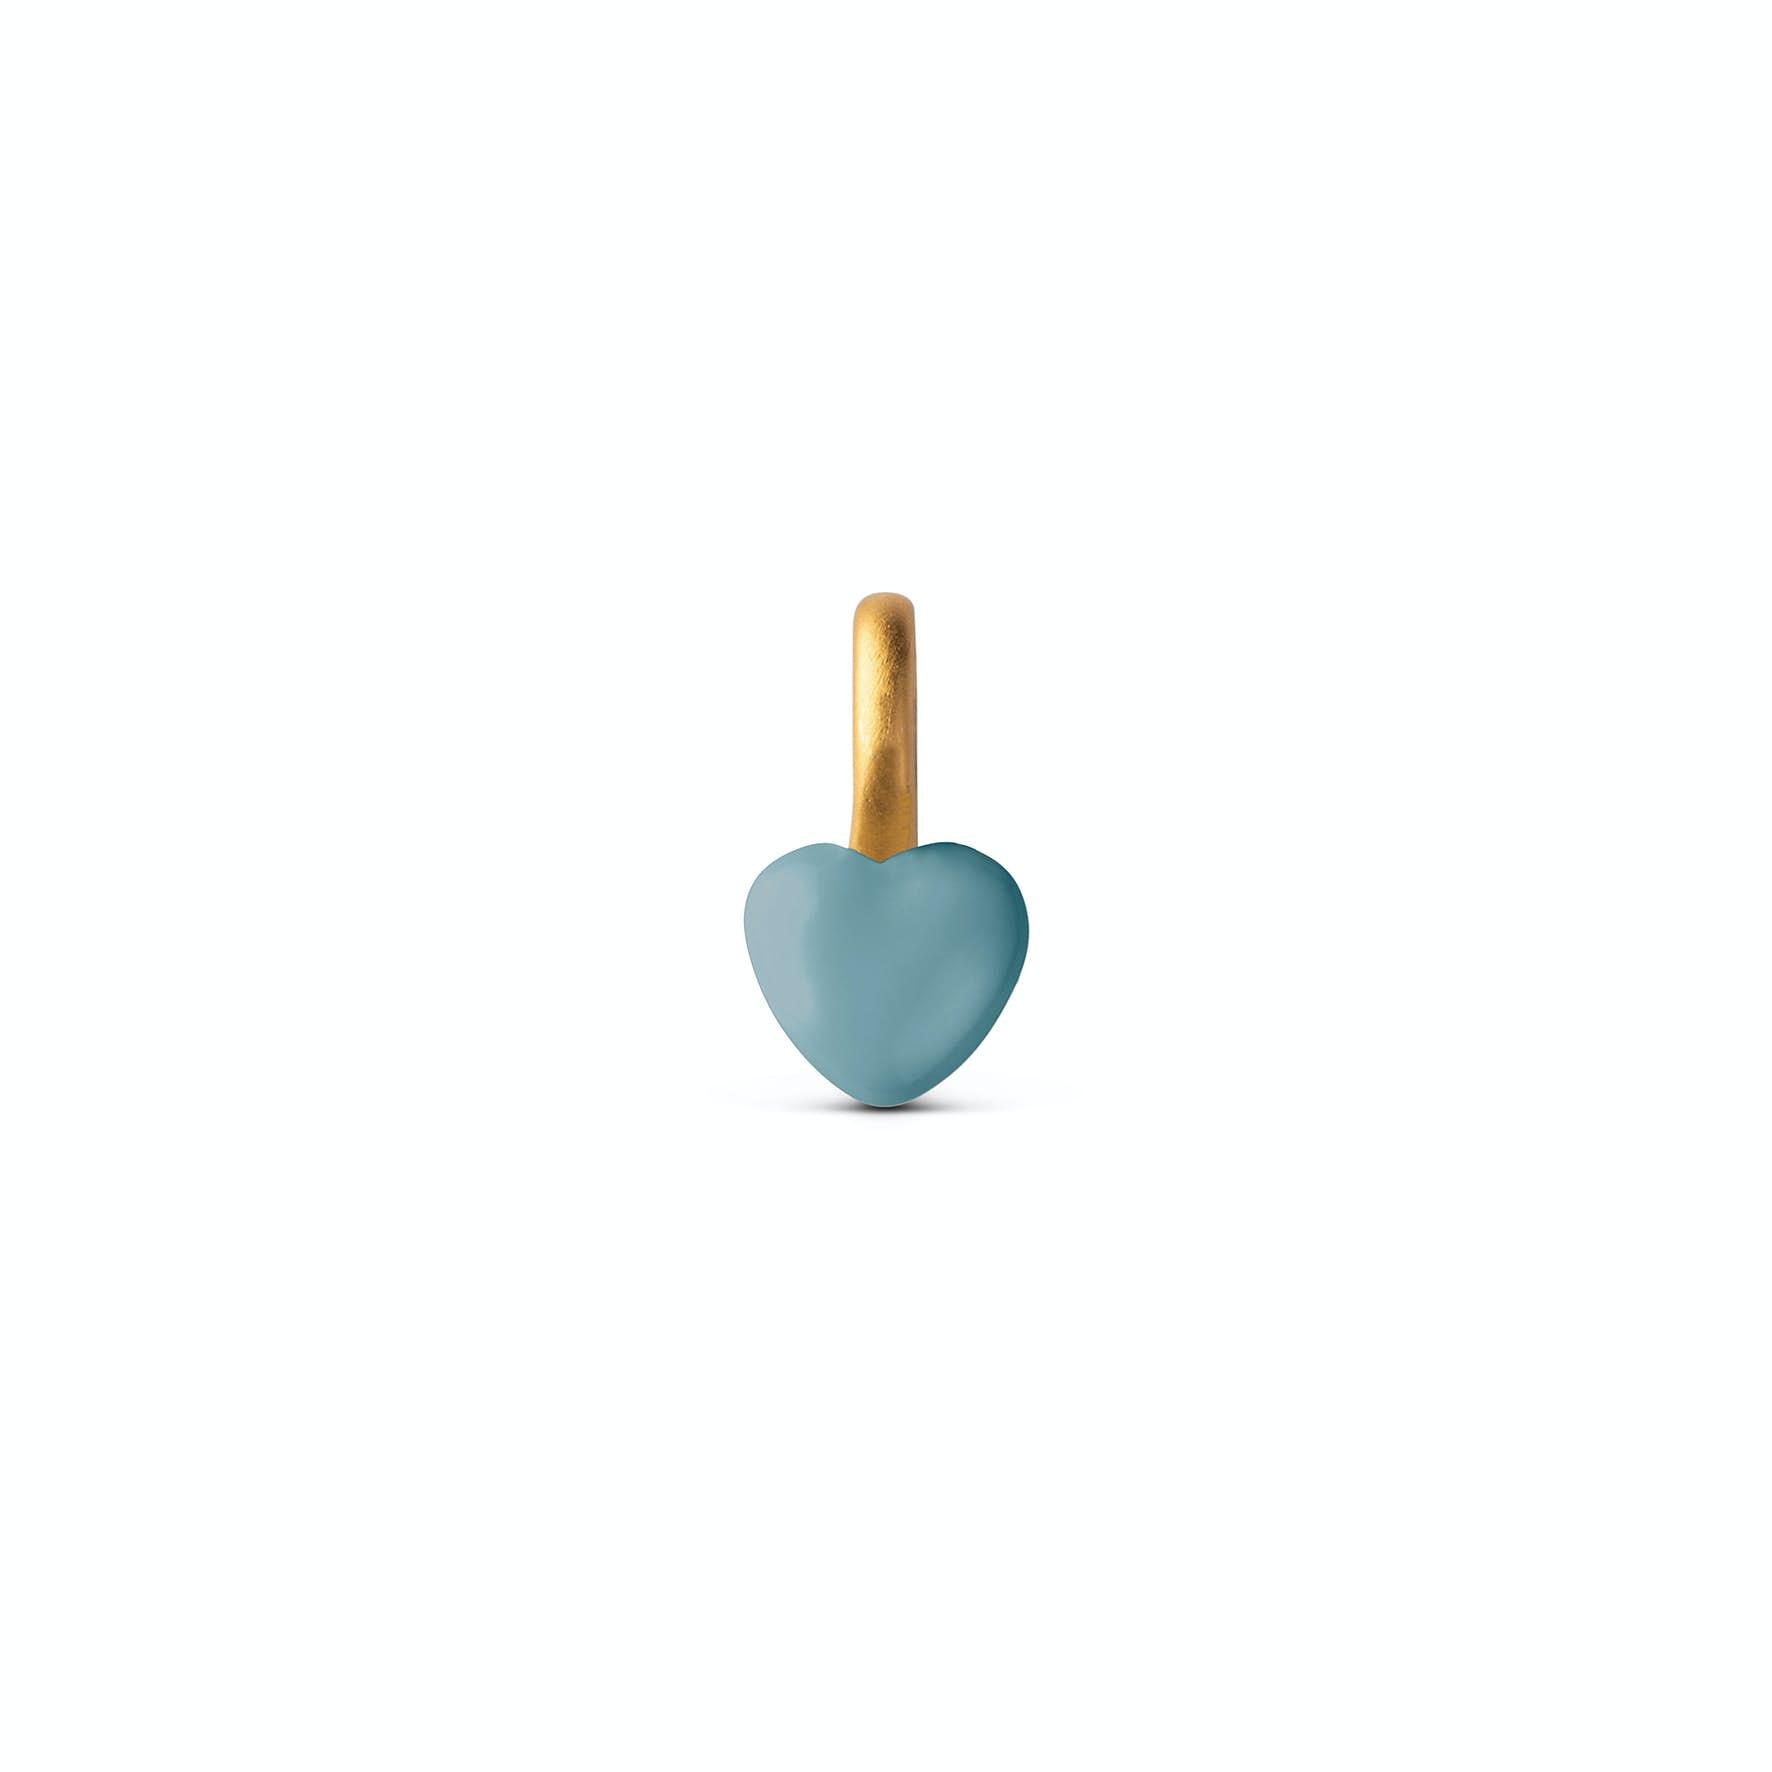 Enamel Heart Charm Dusty Turquoise från Enamel Copenhagen i Förgyllt-Silver Sterling 925